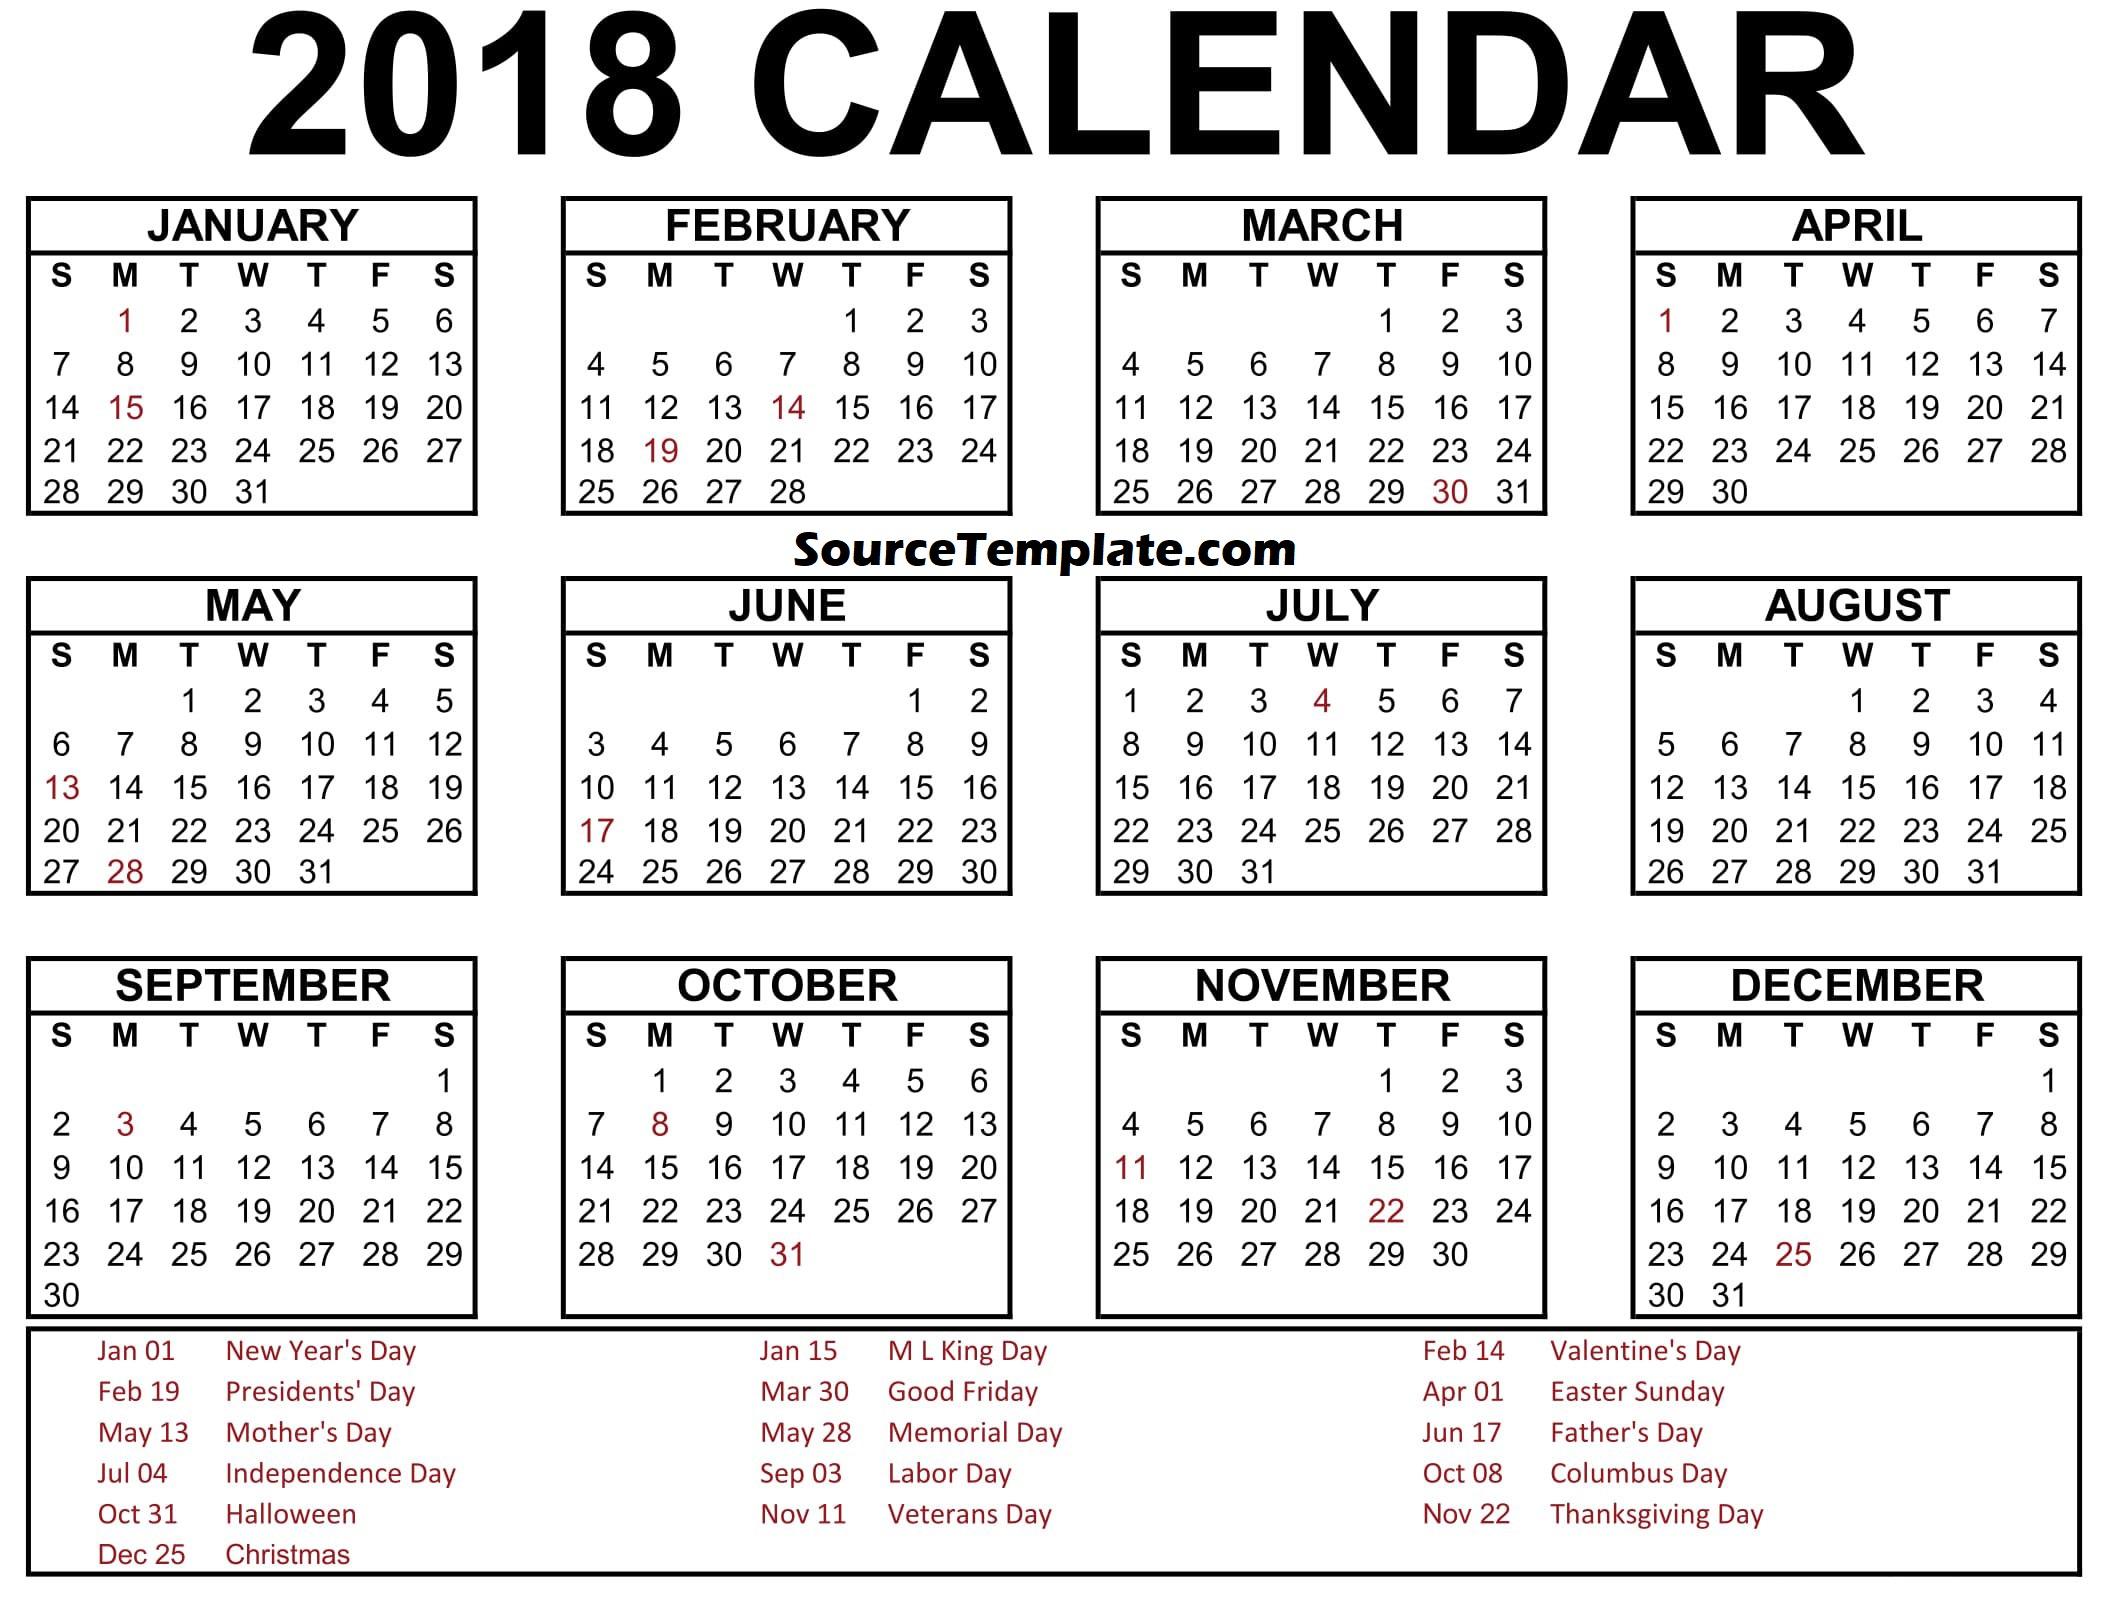 calendar printable template. 2018 clipart calender